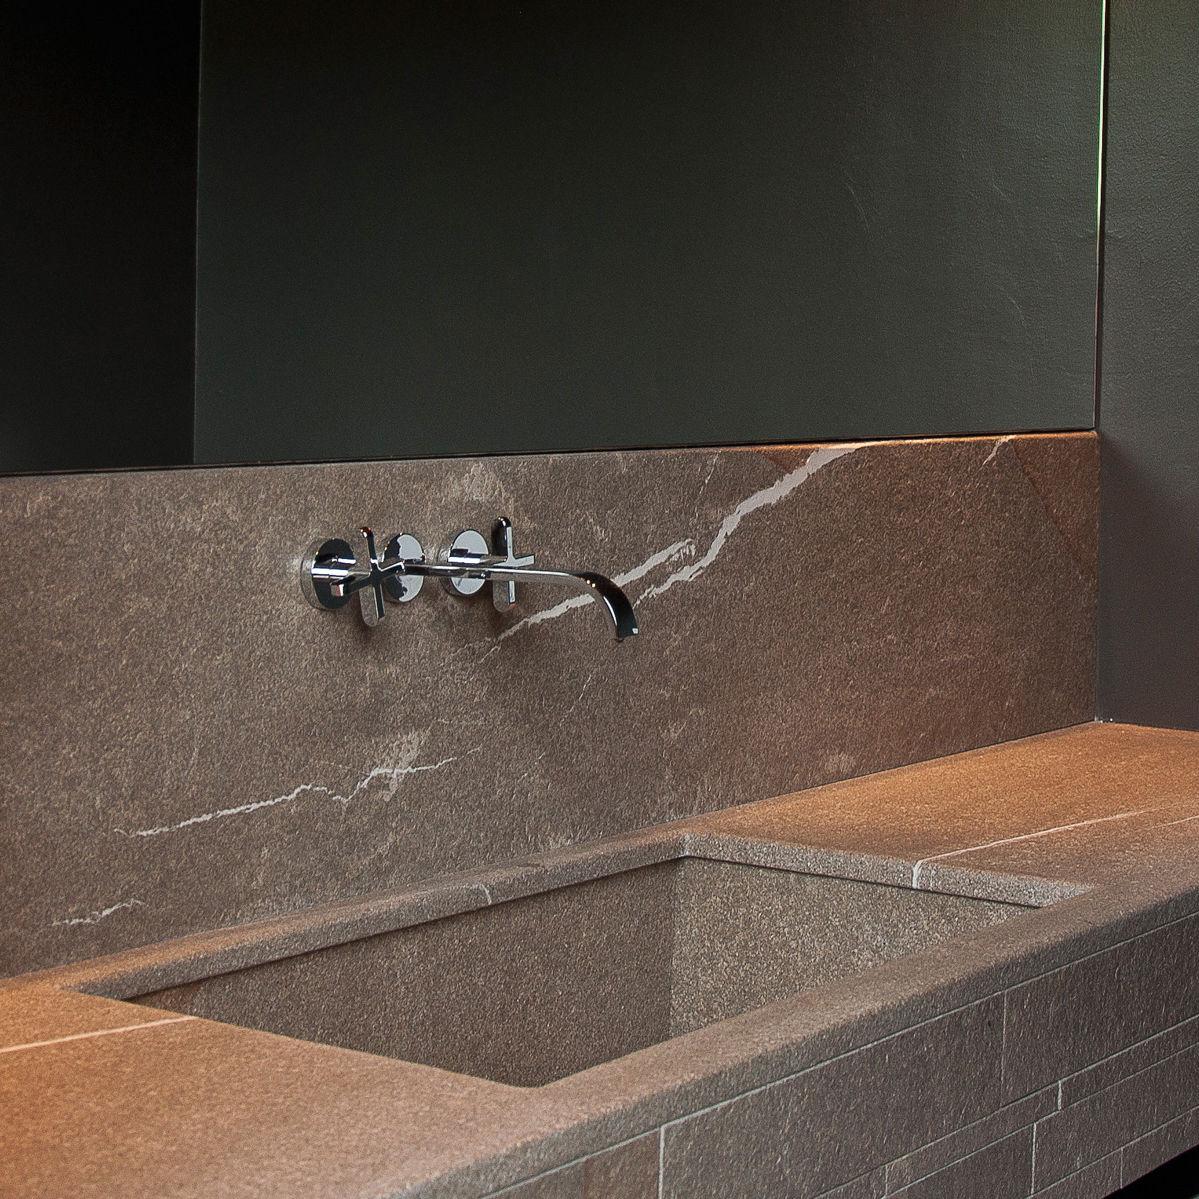 Plan Vasque En Pierre plan vasque en pierre - top bagno - millimetri4 s.r.l.